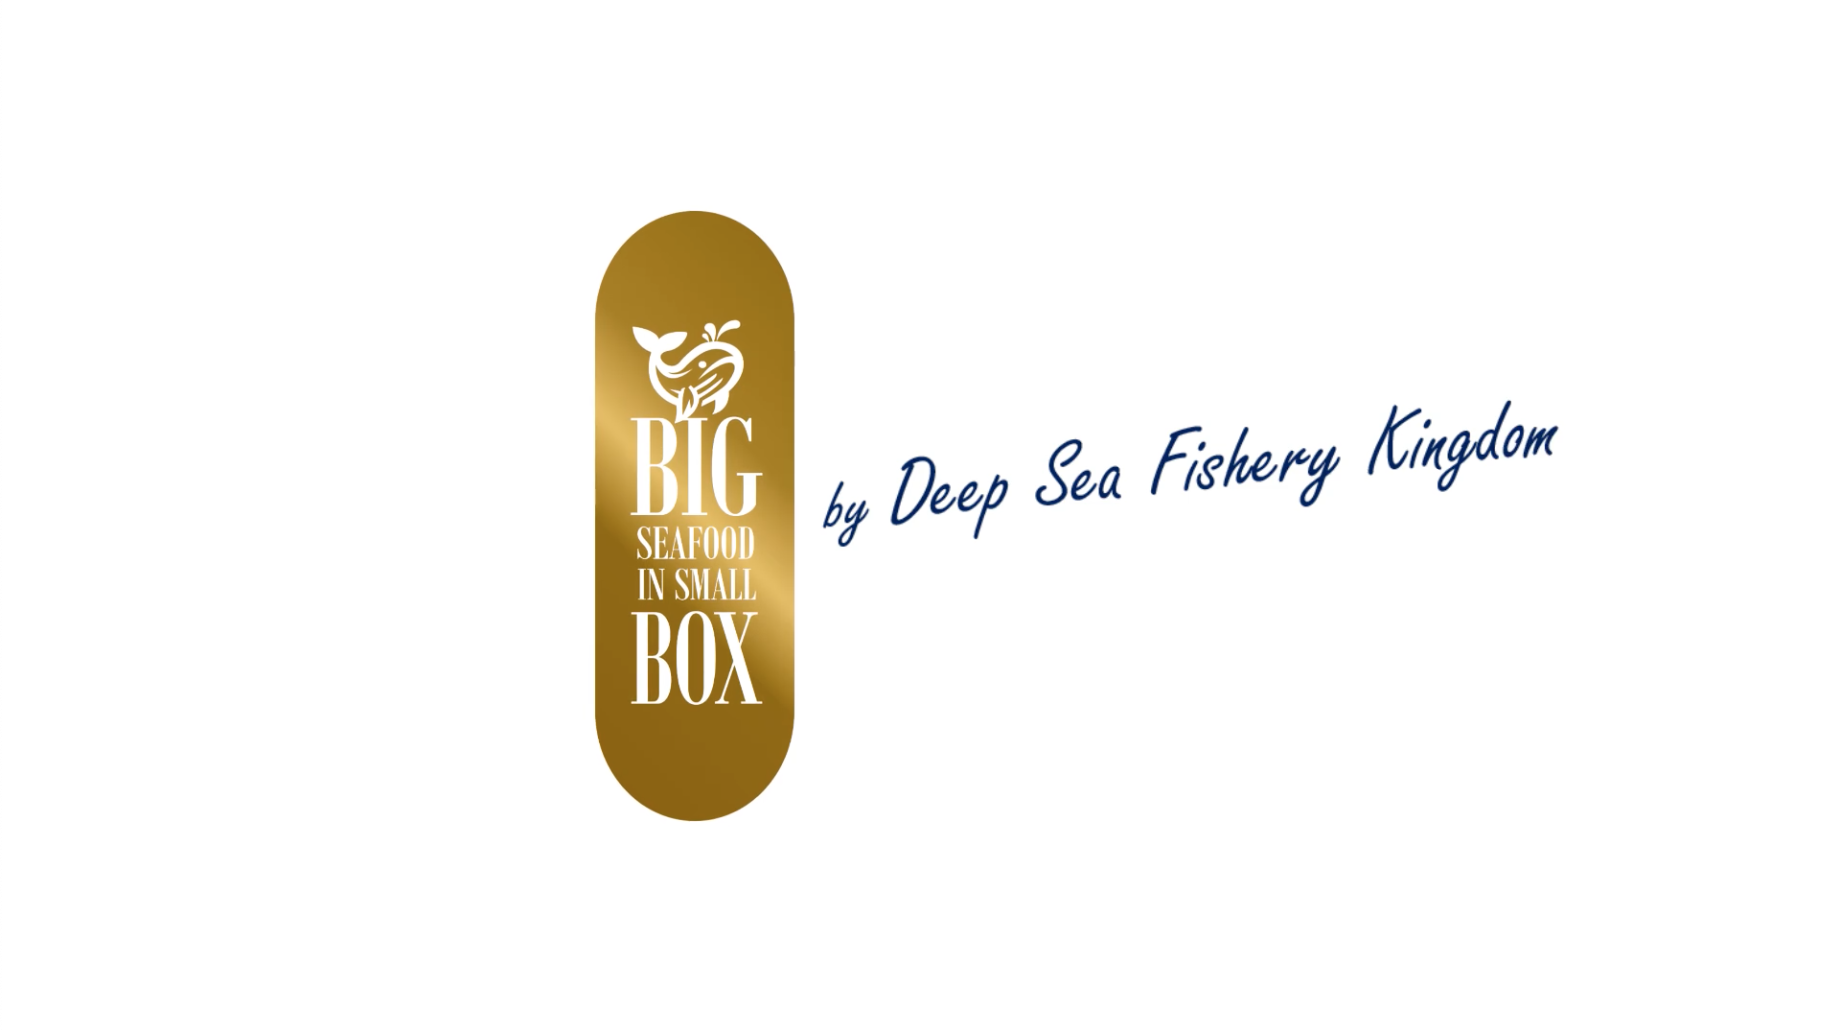 big seafood in a small box by deep sea fishery kingdom